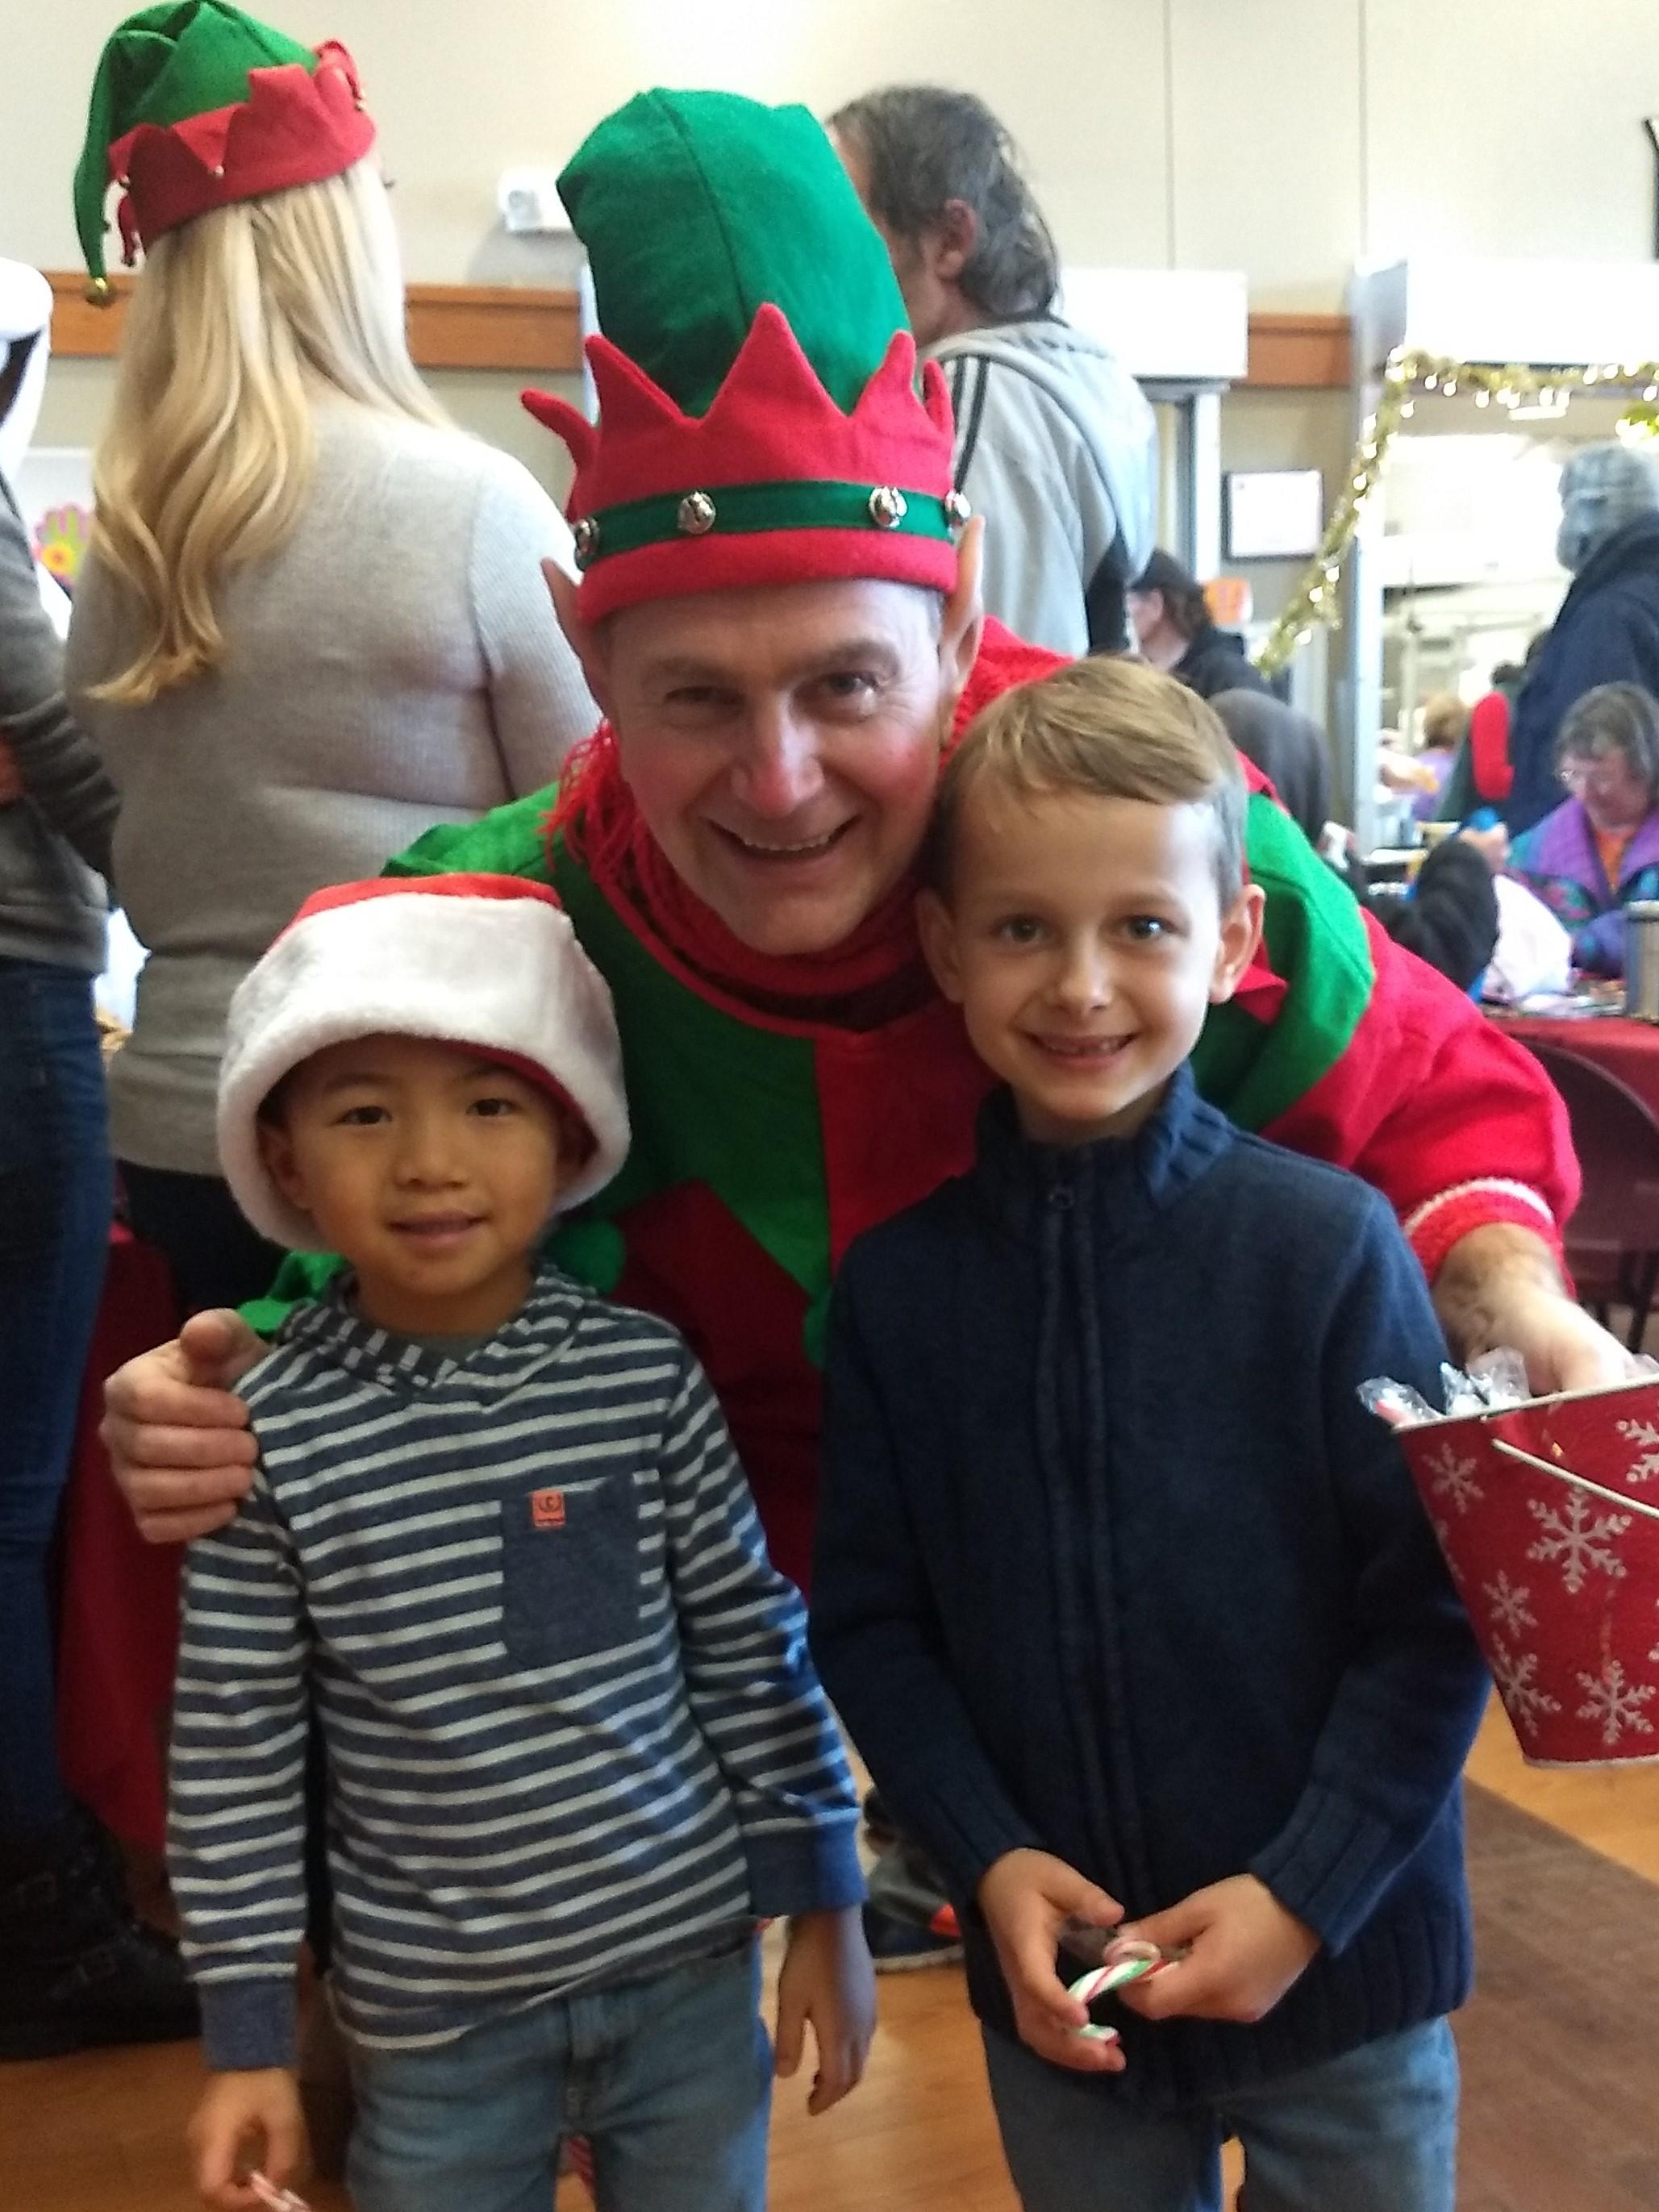 Fiesta Fun Brings Holiday Cheer to Guests